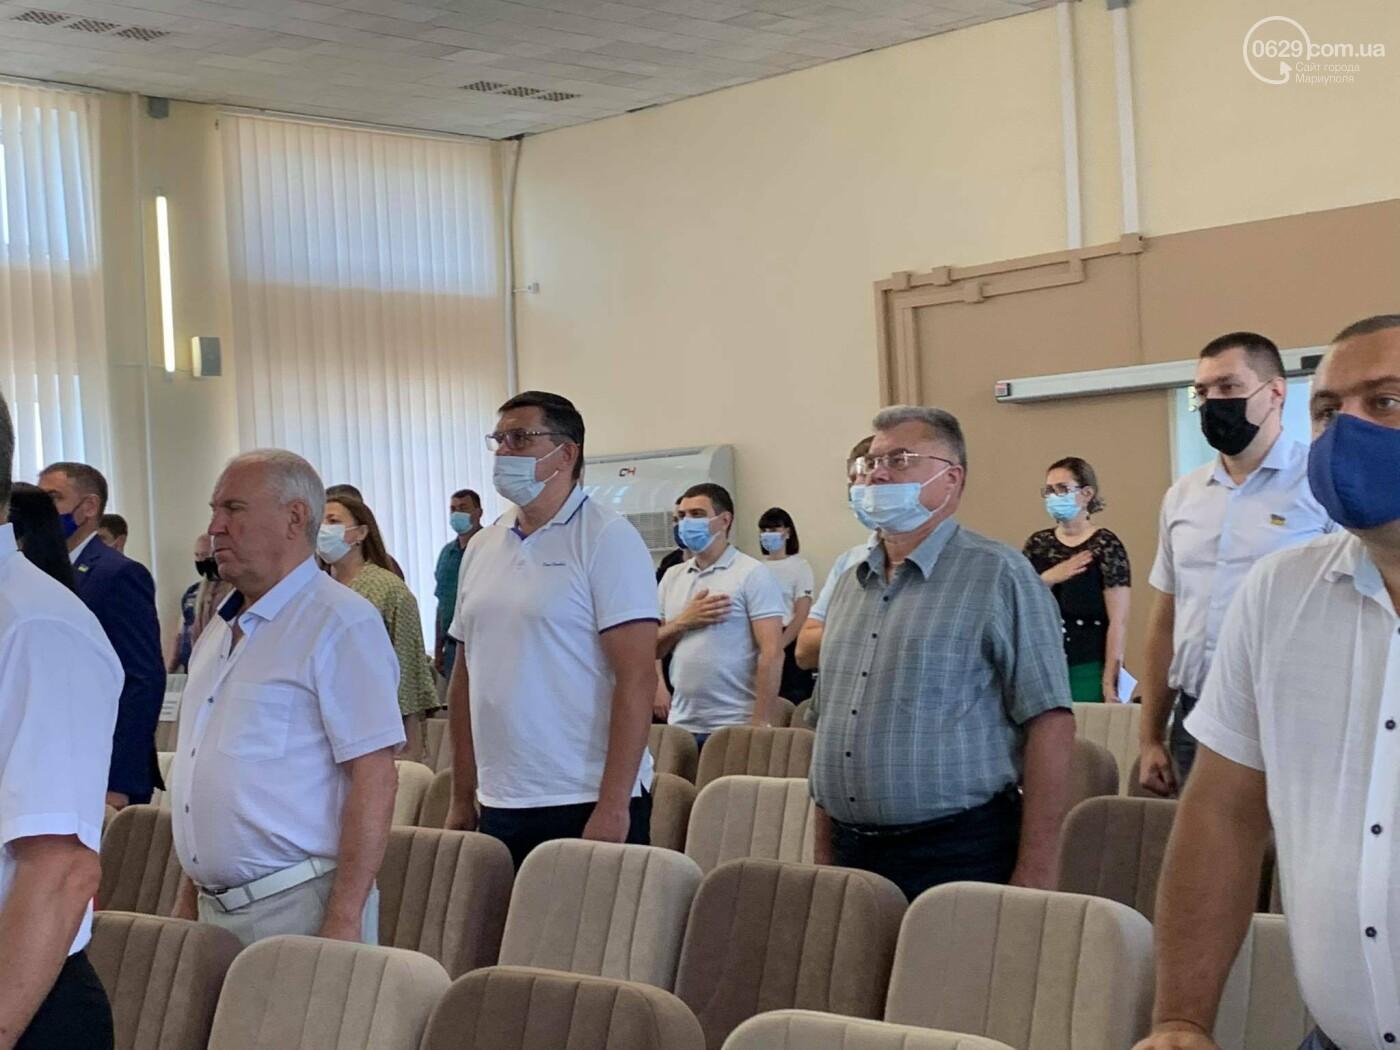 В Мариуполе стартовала сессия горсовета, - ФОТО, фото-8